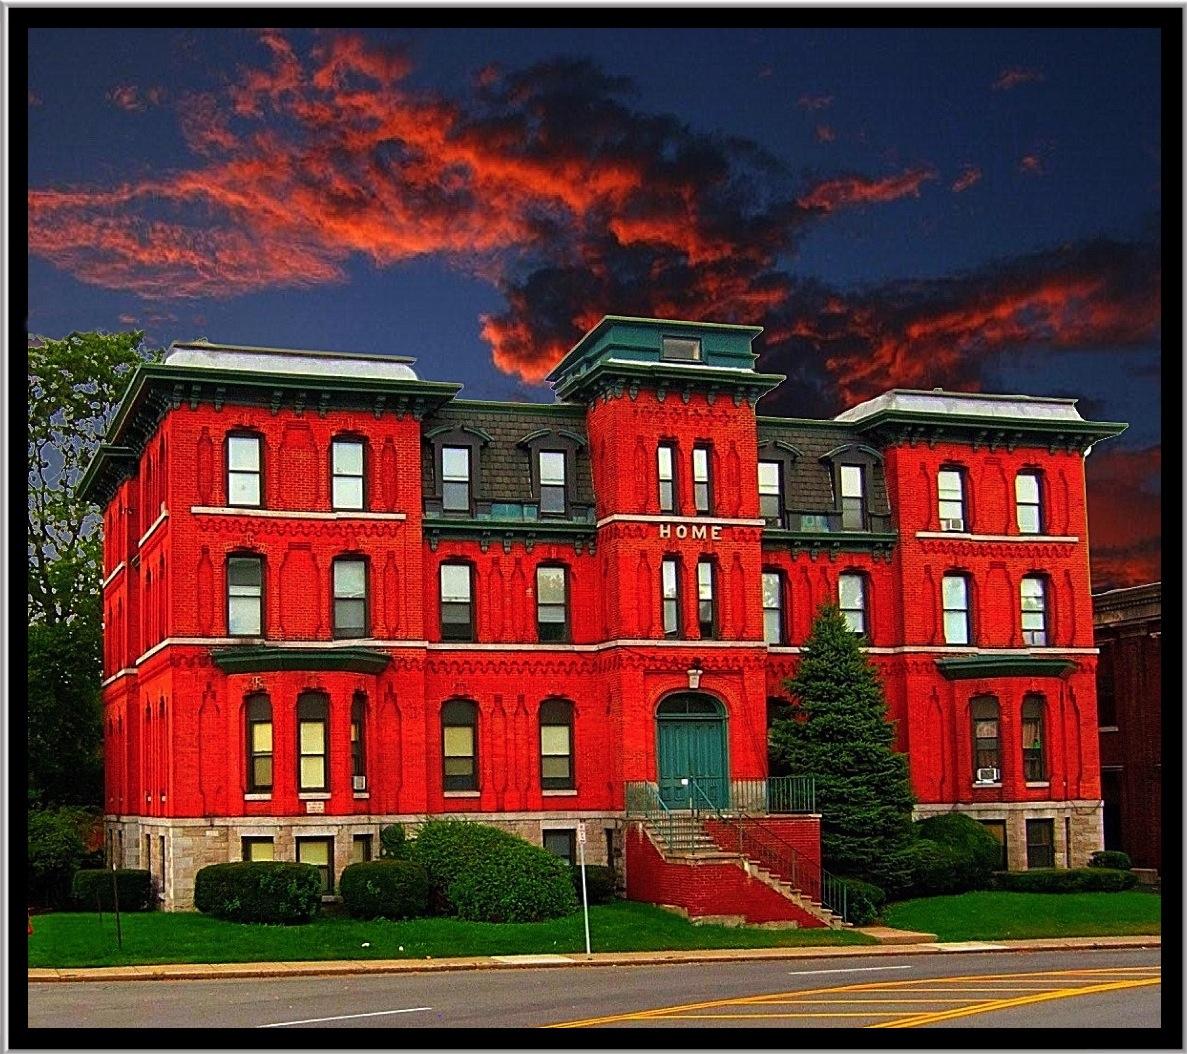 Sunset Village Apartments: Manlius, NY, USA Sunrise Sunset Times